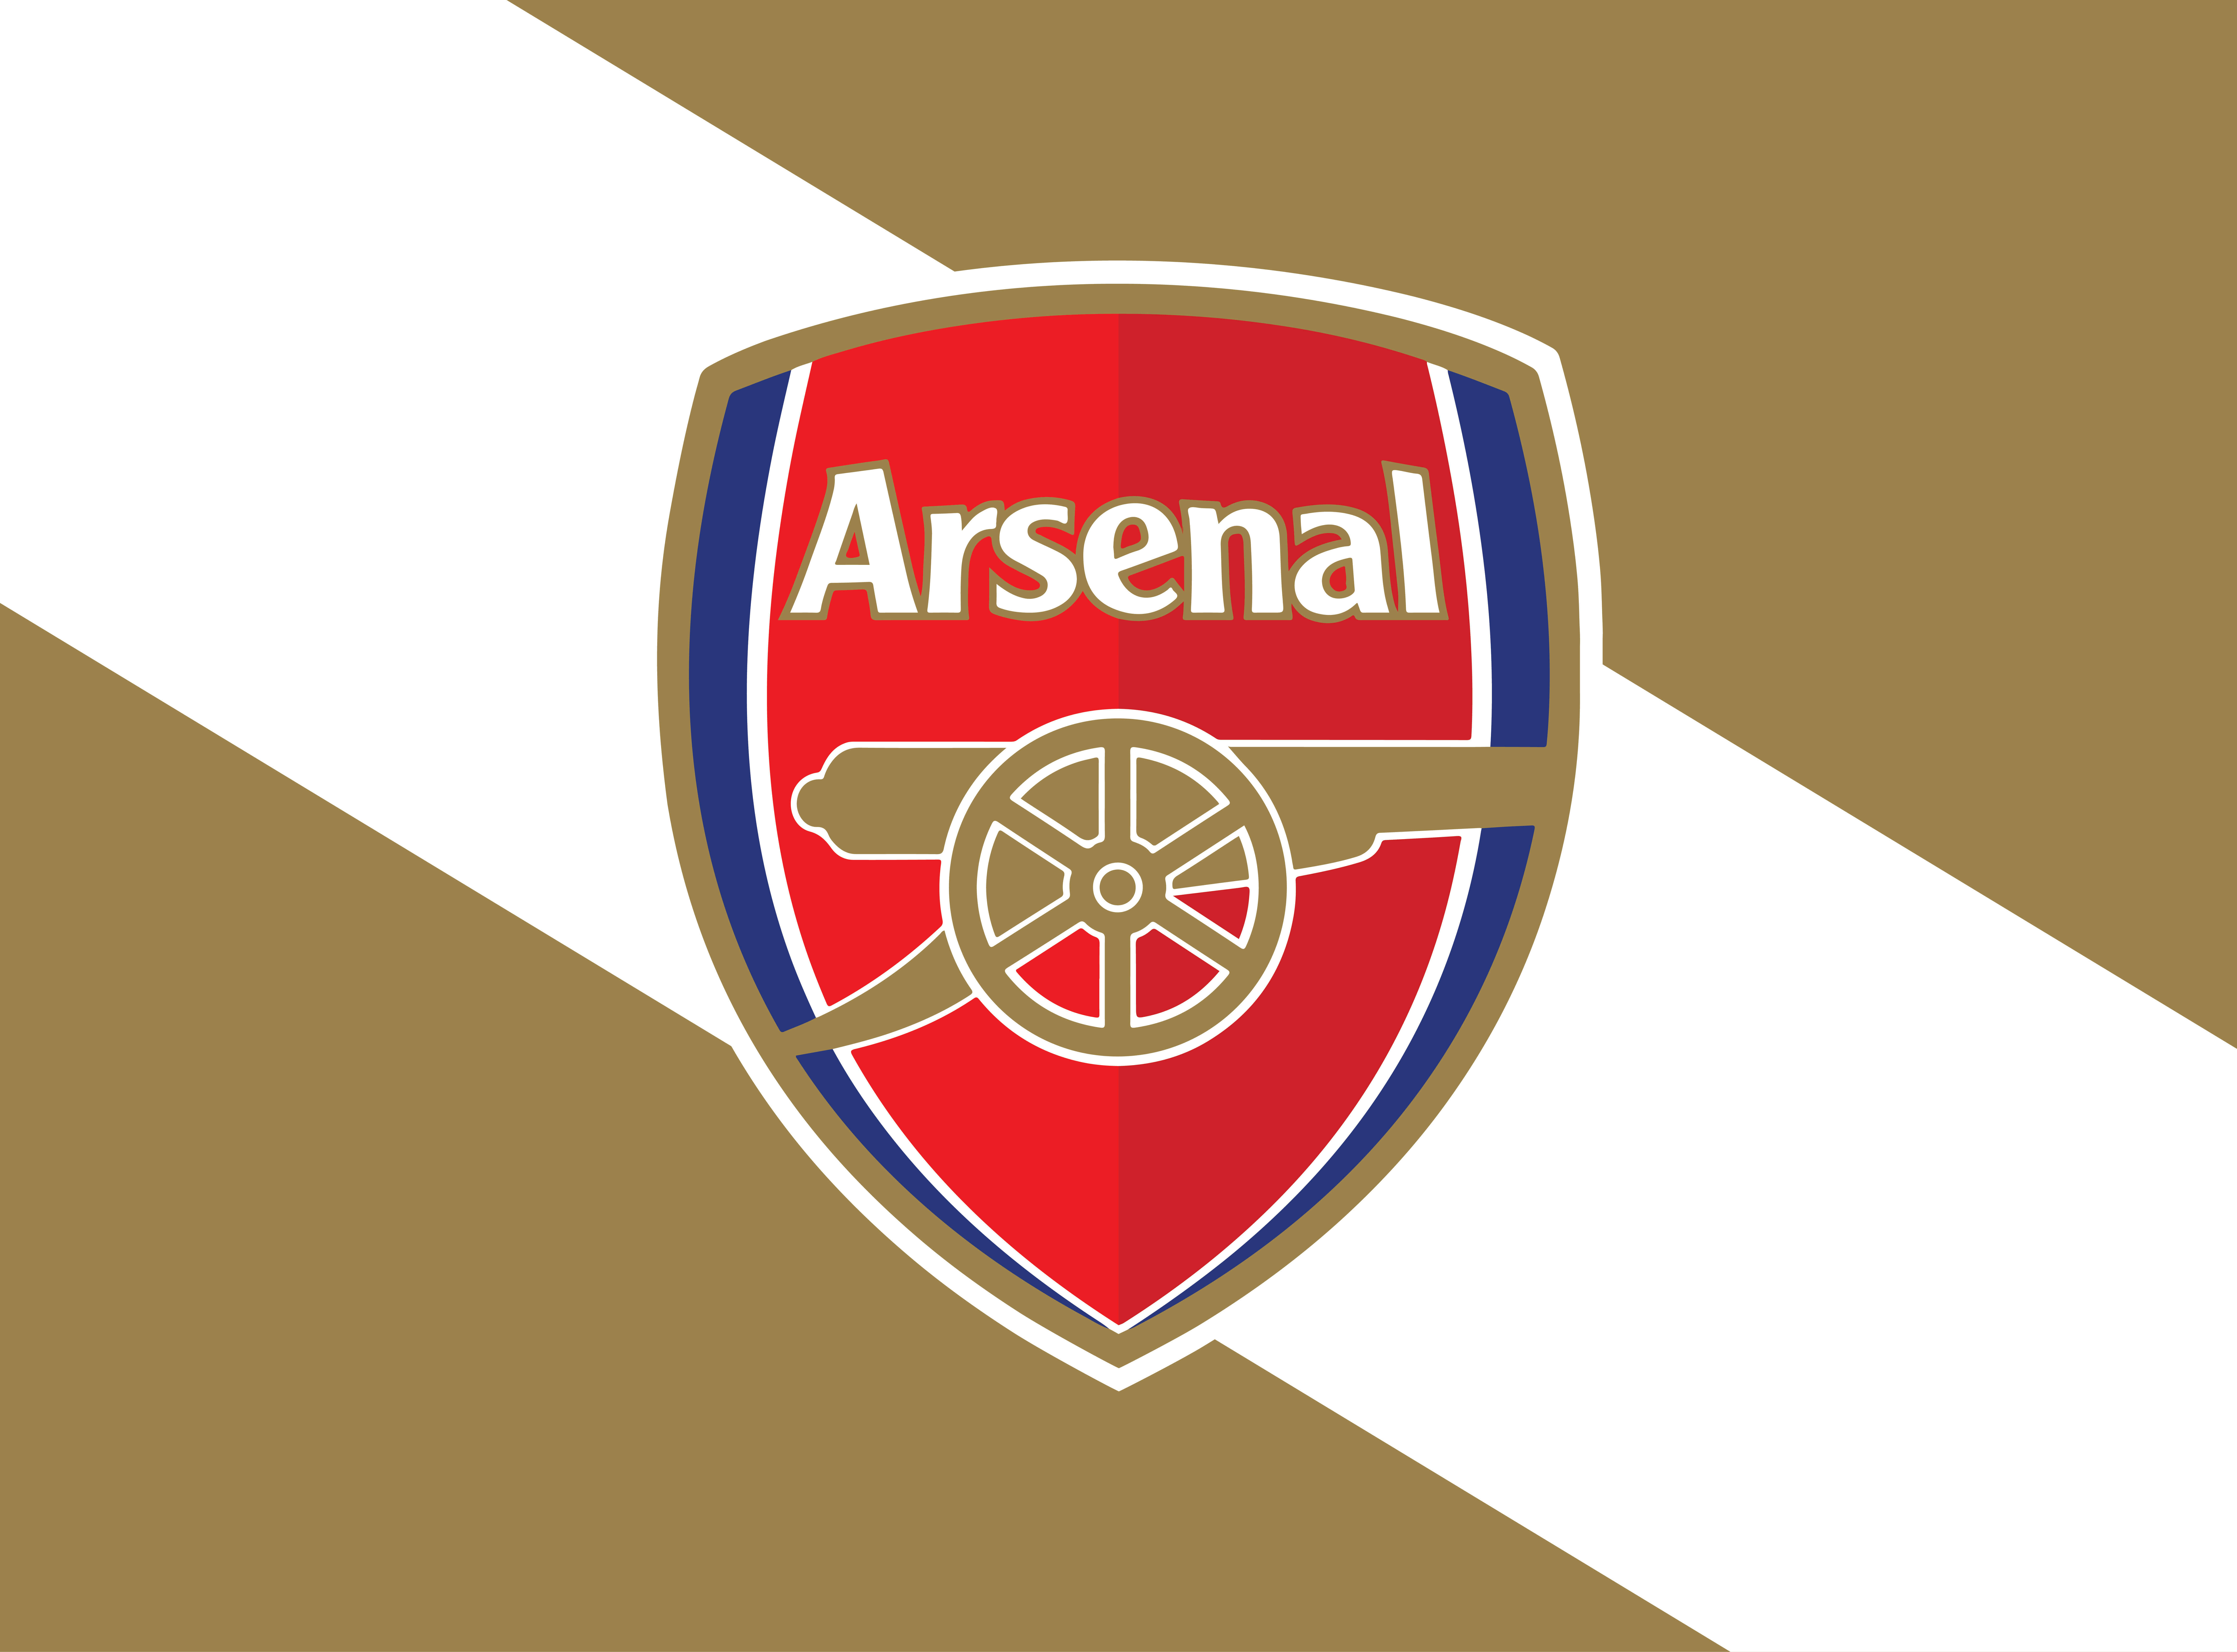 Premier League Football club Arsenal partners with Global Kapital Group